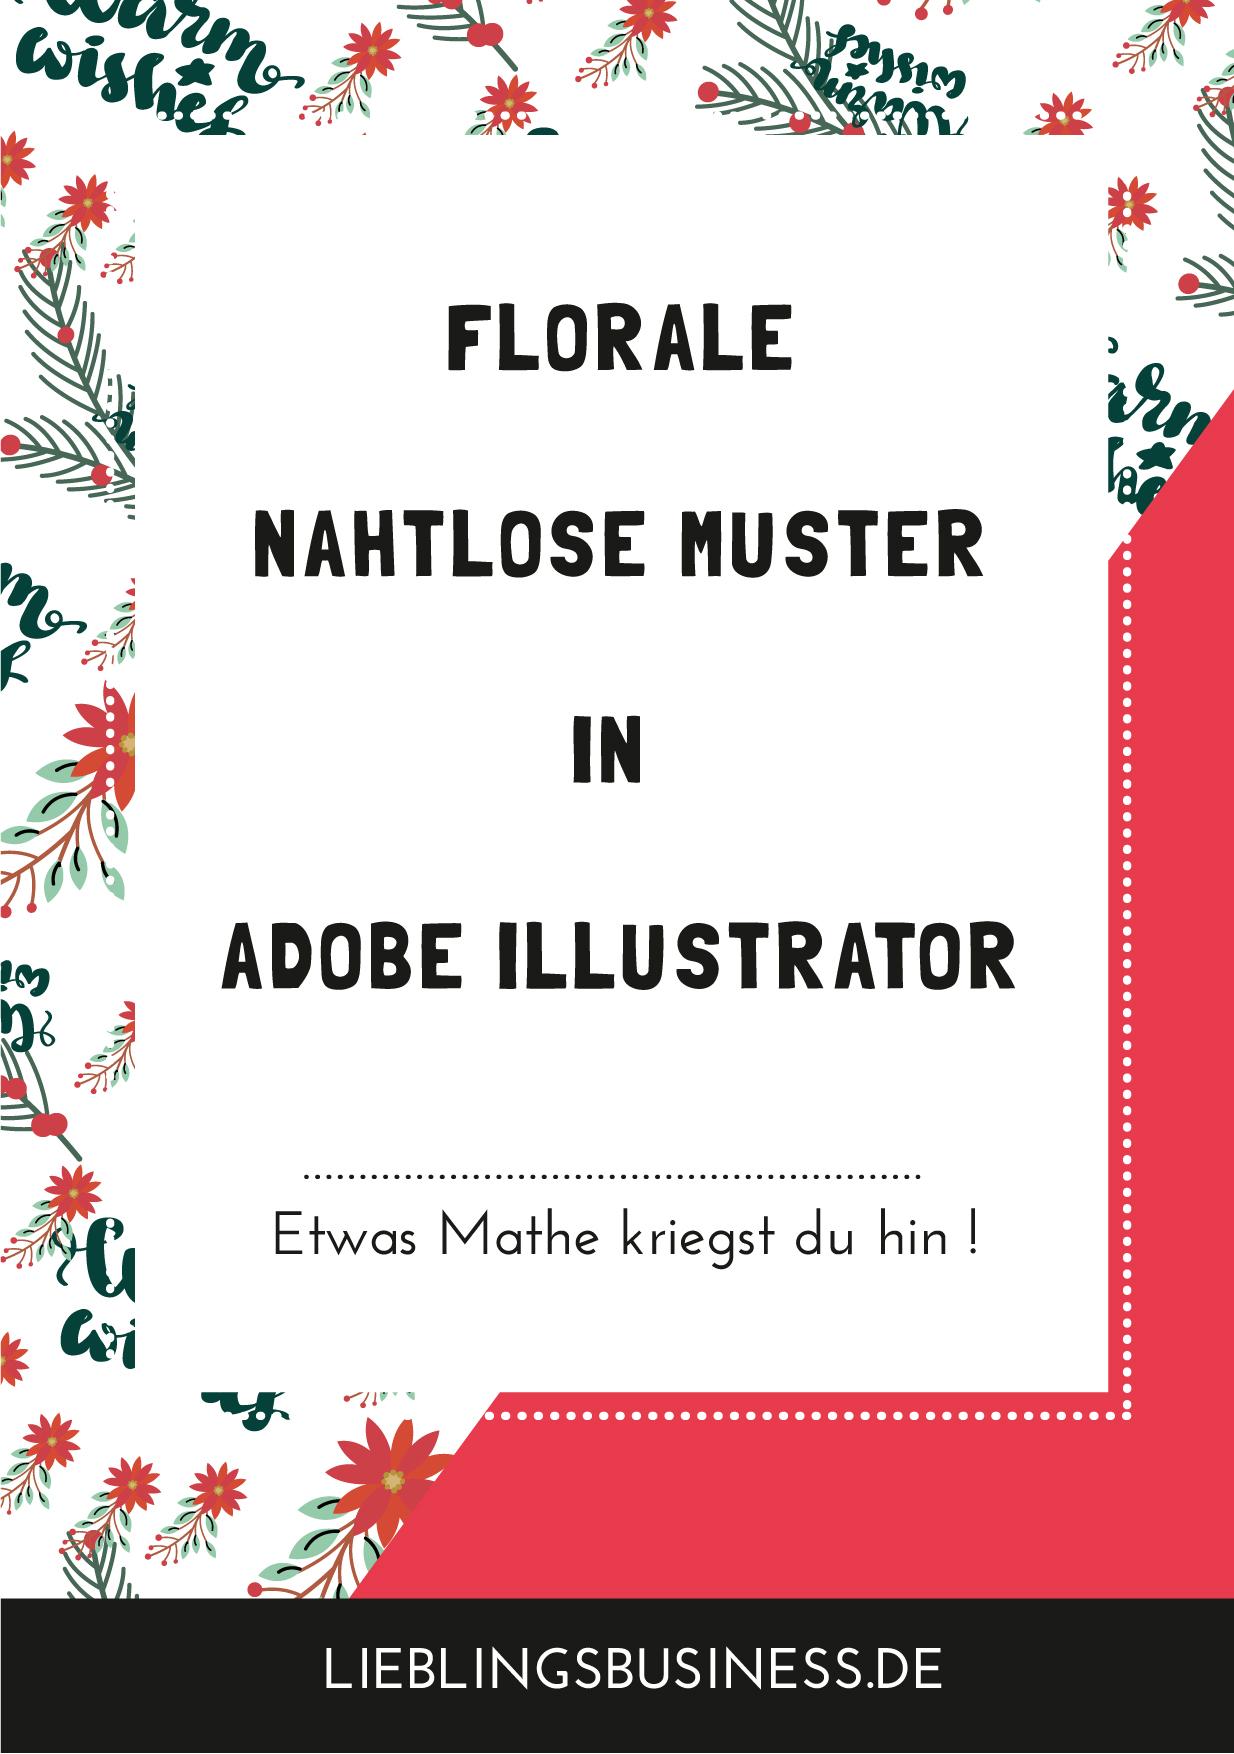 illustrator_nahlose_muster.jpg